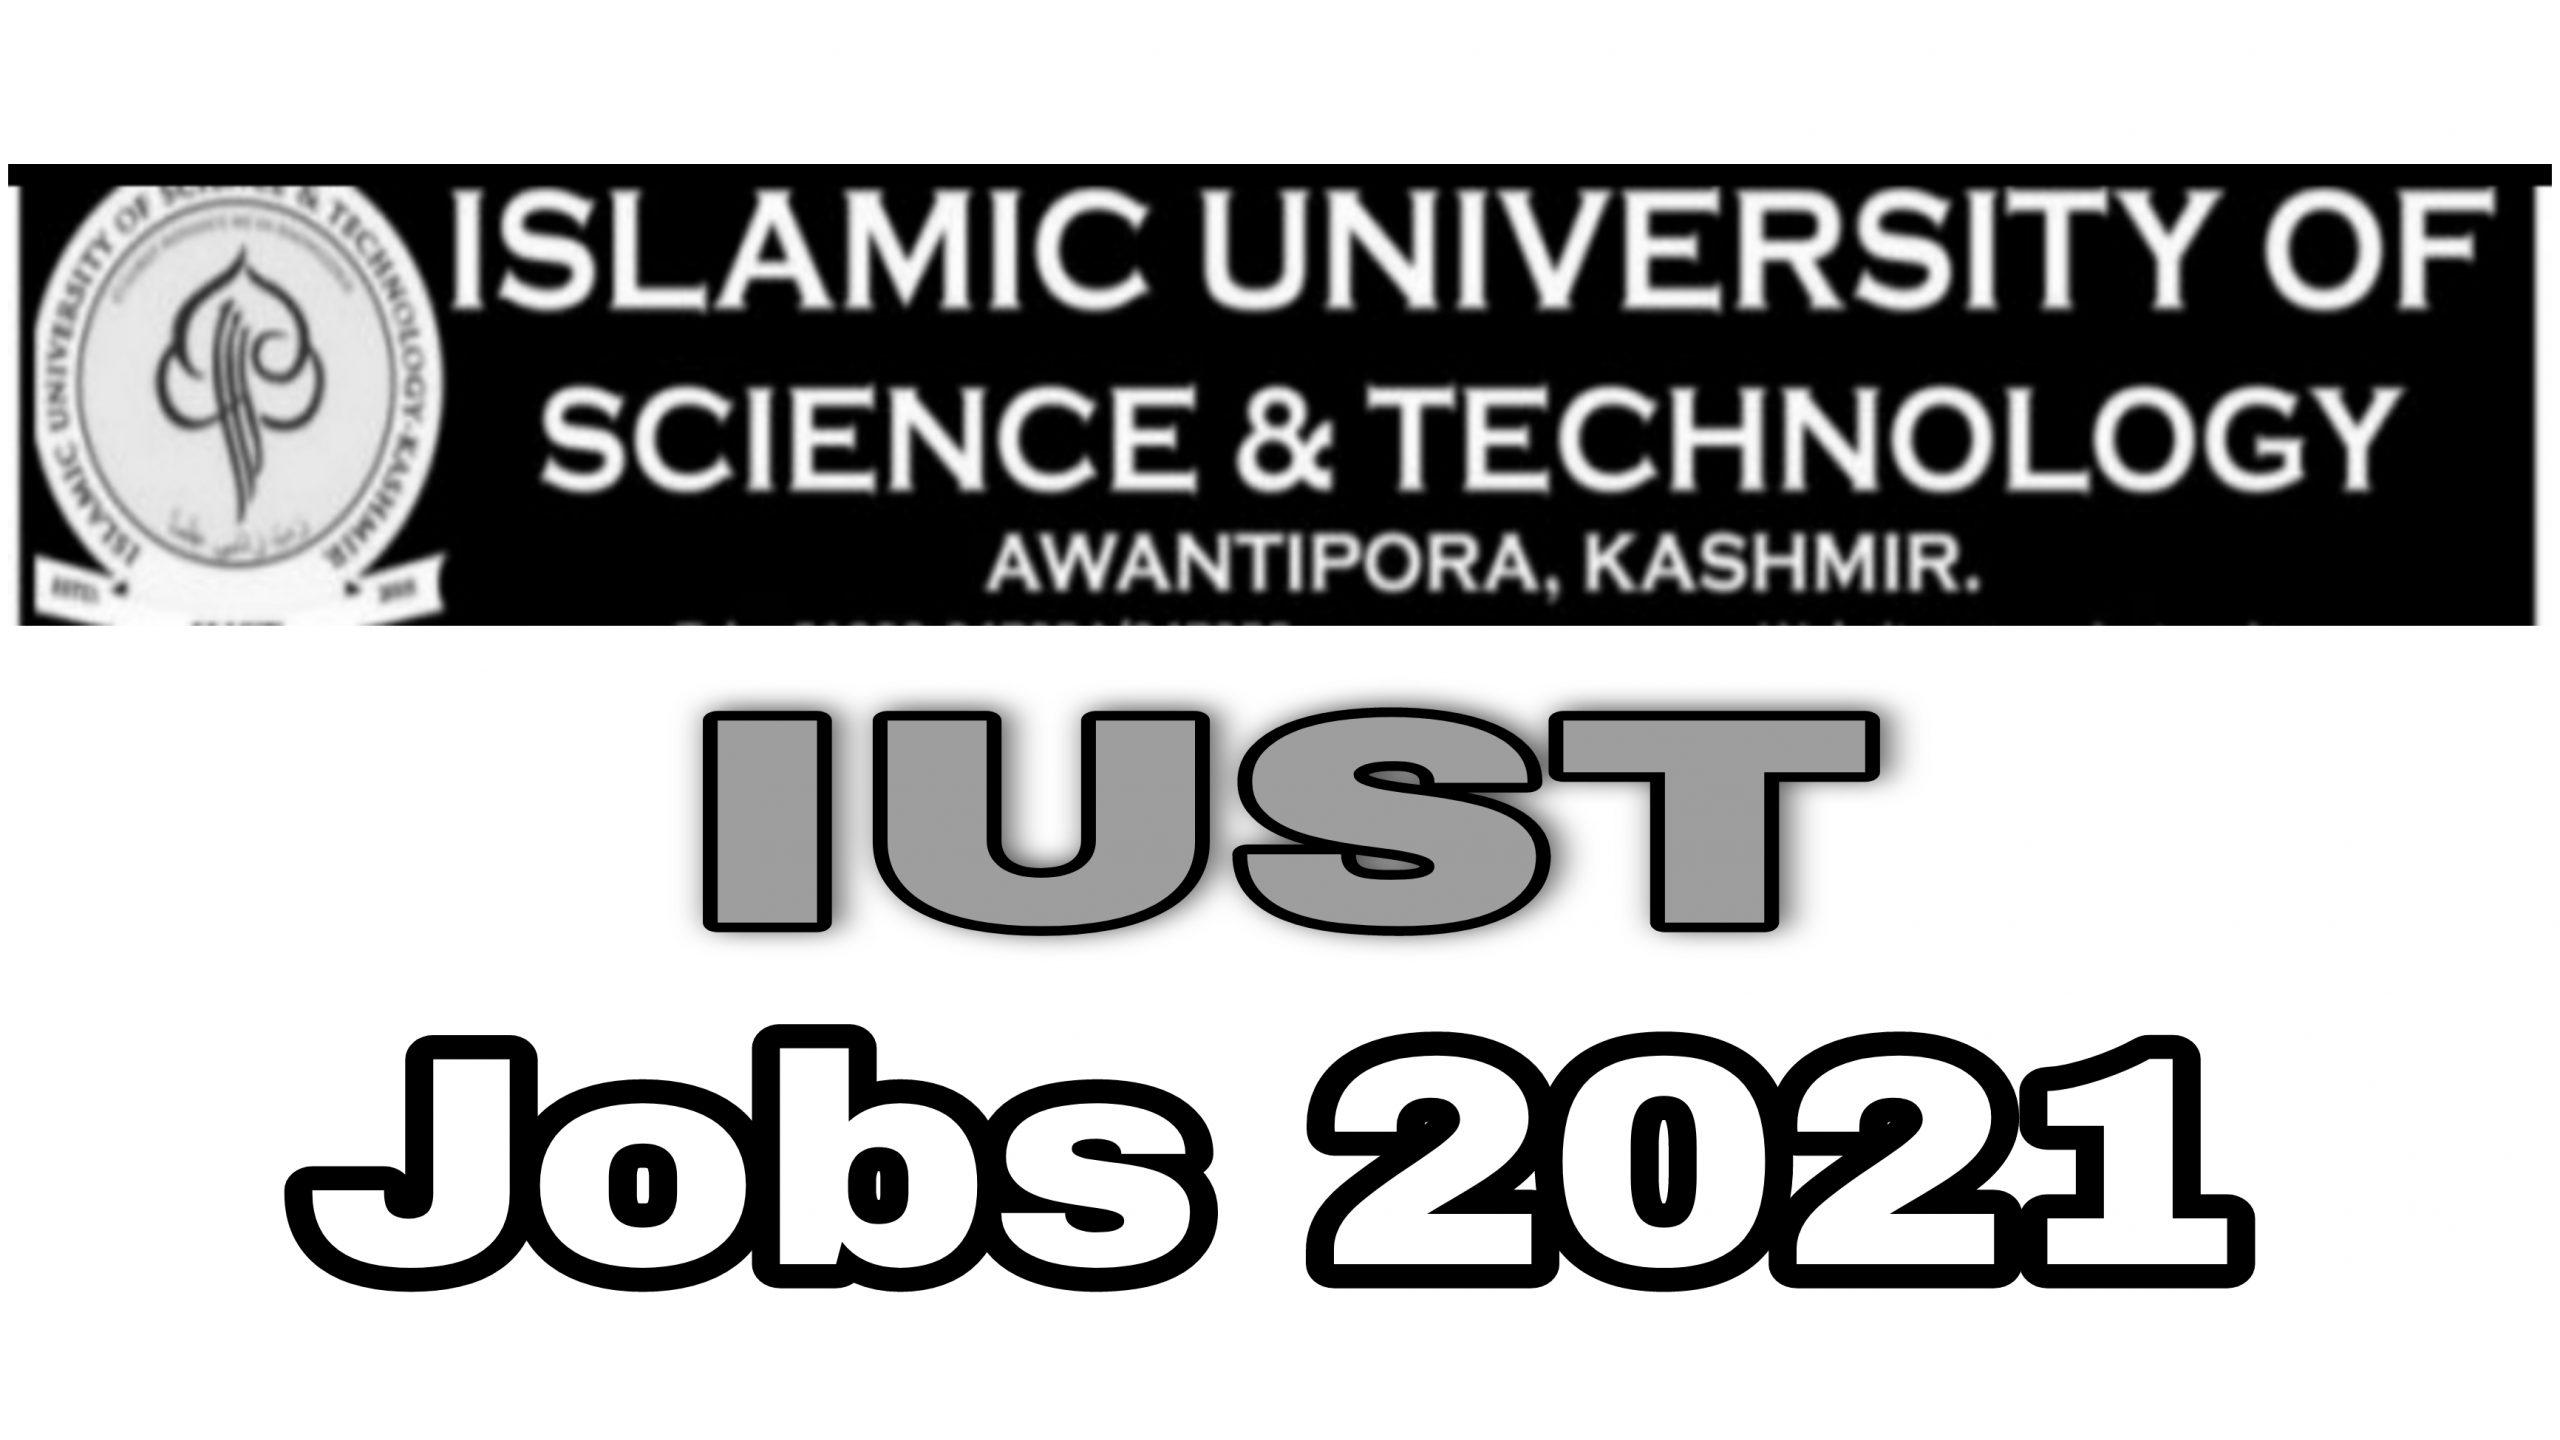 Iust awantipora job vacancy 2021 Latest notification islamic university of science and technology Kashmir Jobs